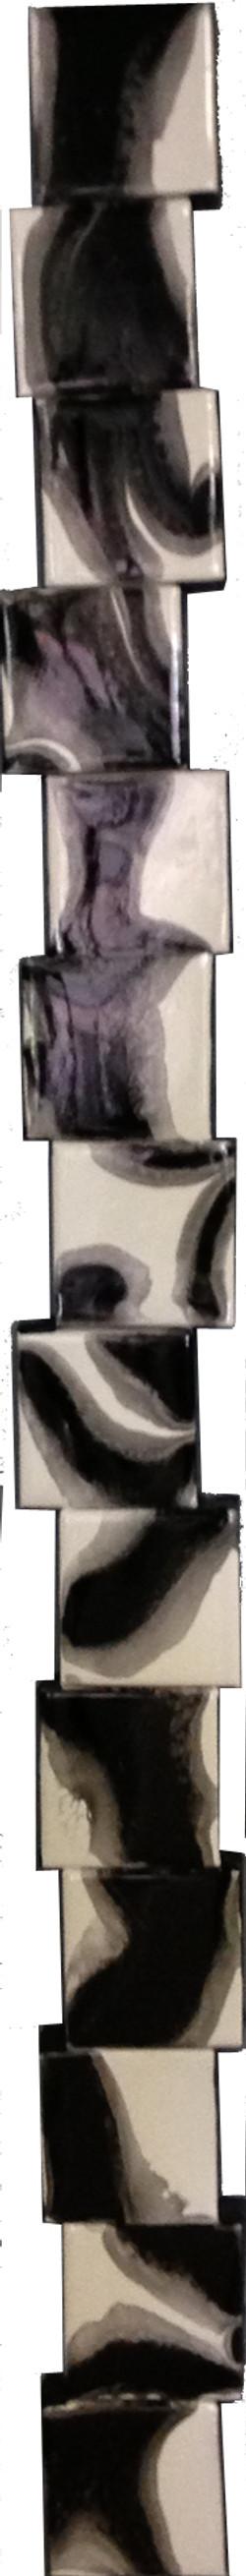 Zebraica.5.6x60.285 copy